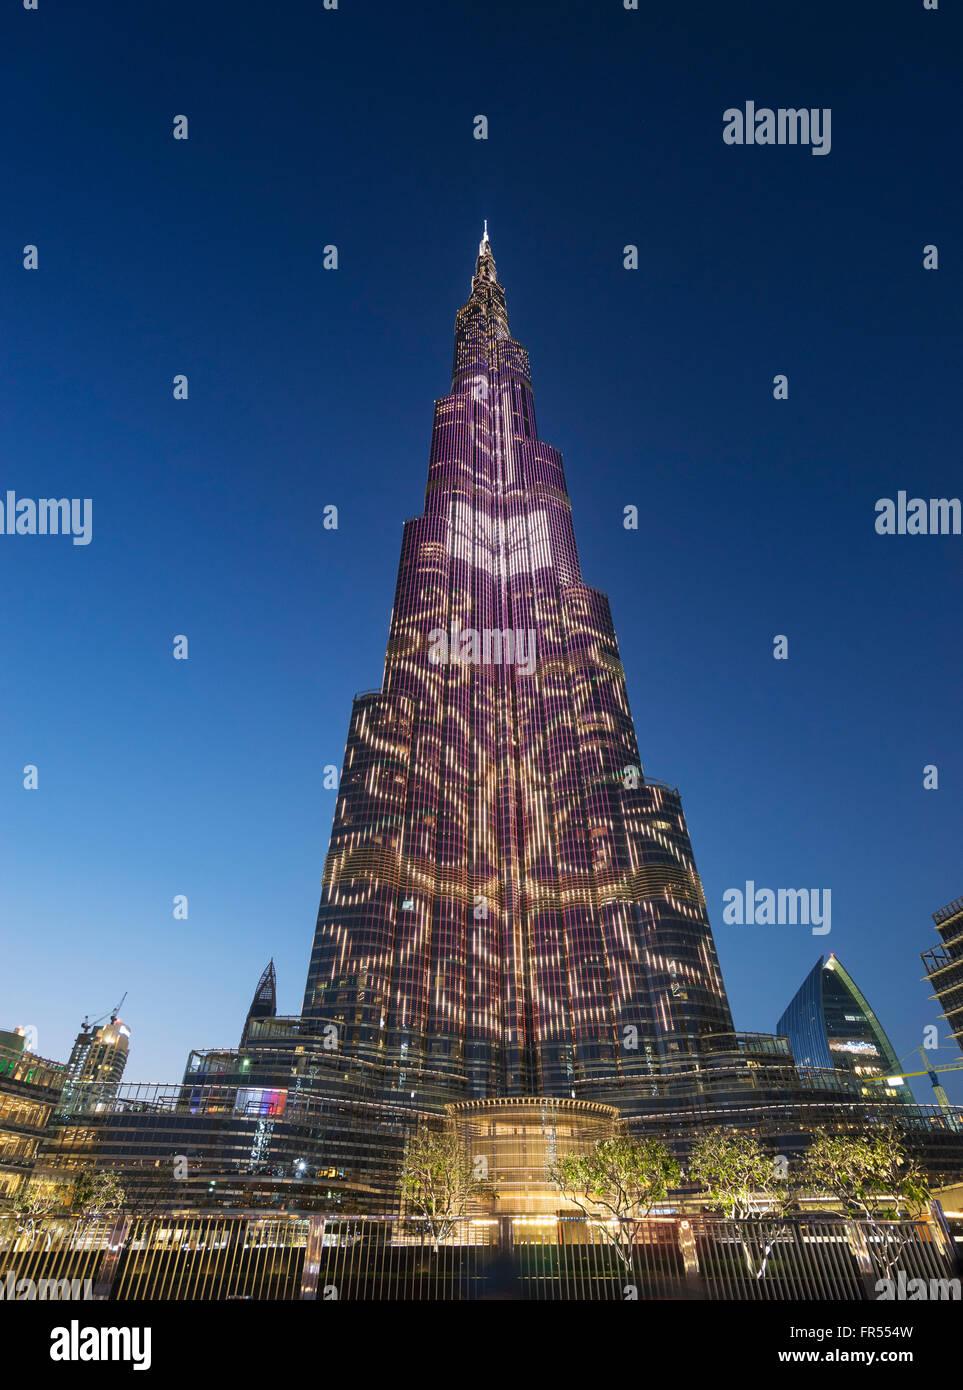 Dusk view of Burj Khalifa tower with LED patterns on facade in Dubai United Arab Emirates - Stock Image